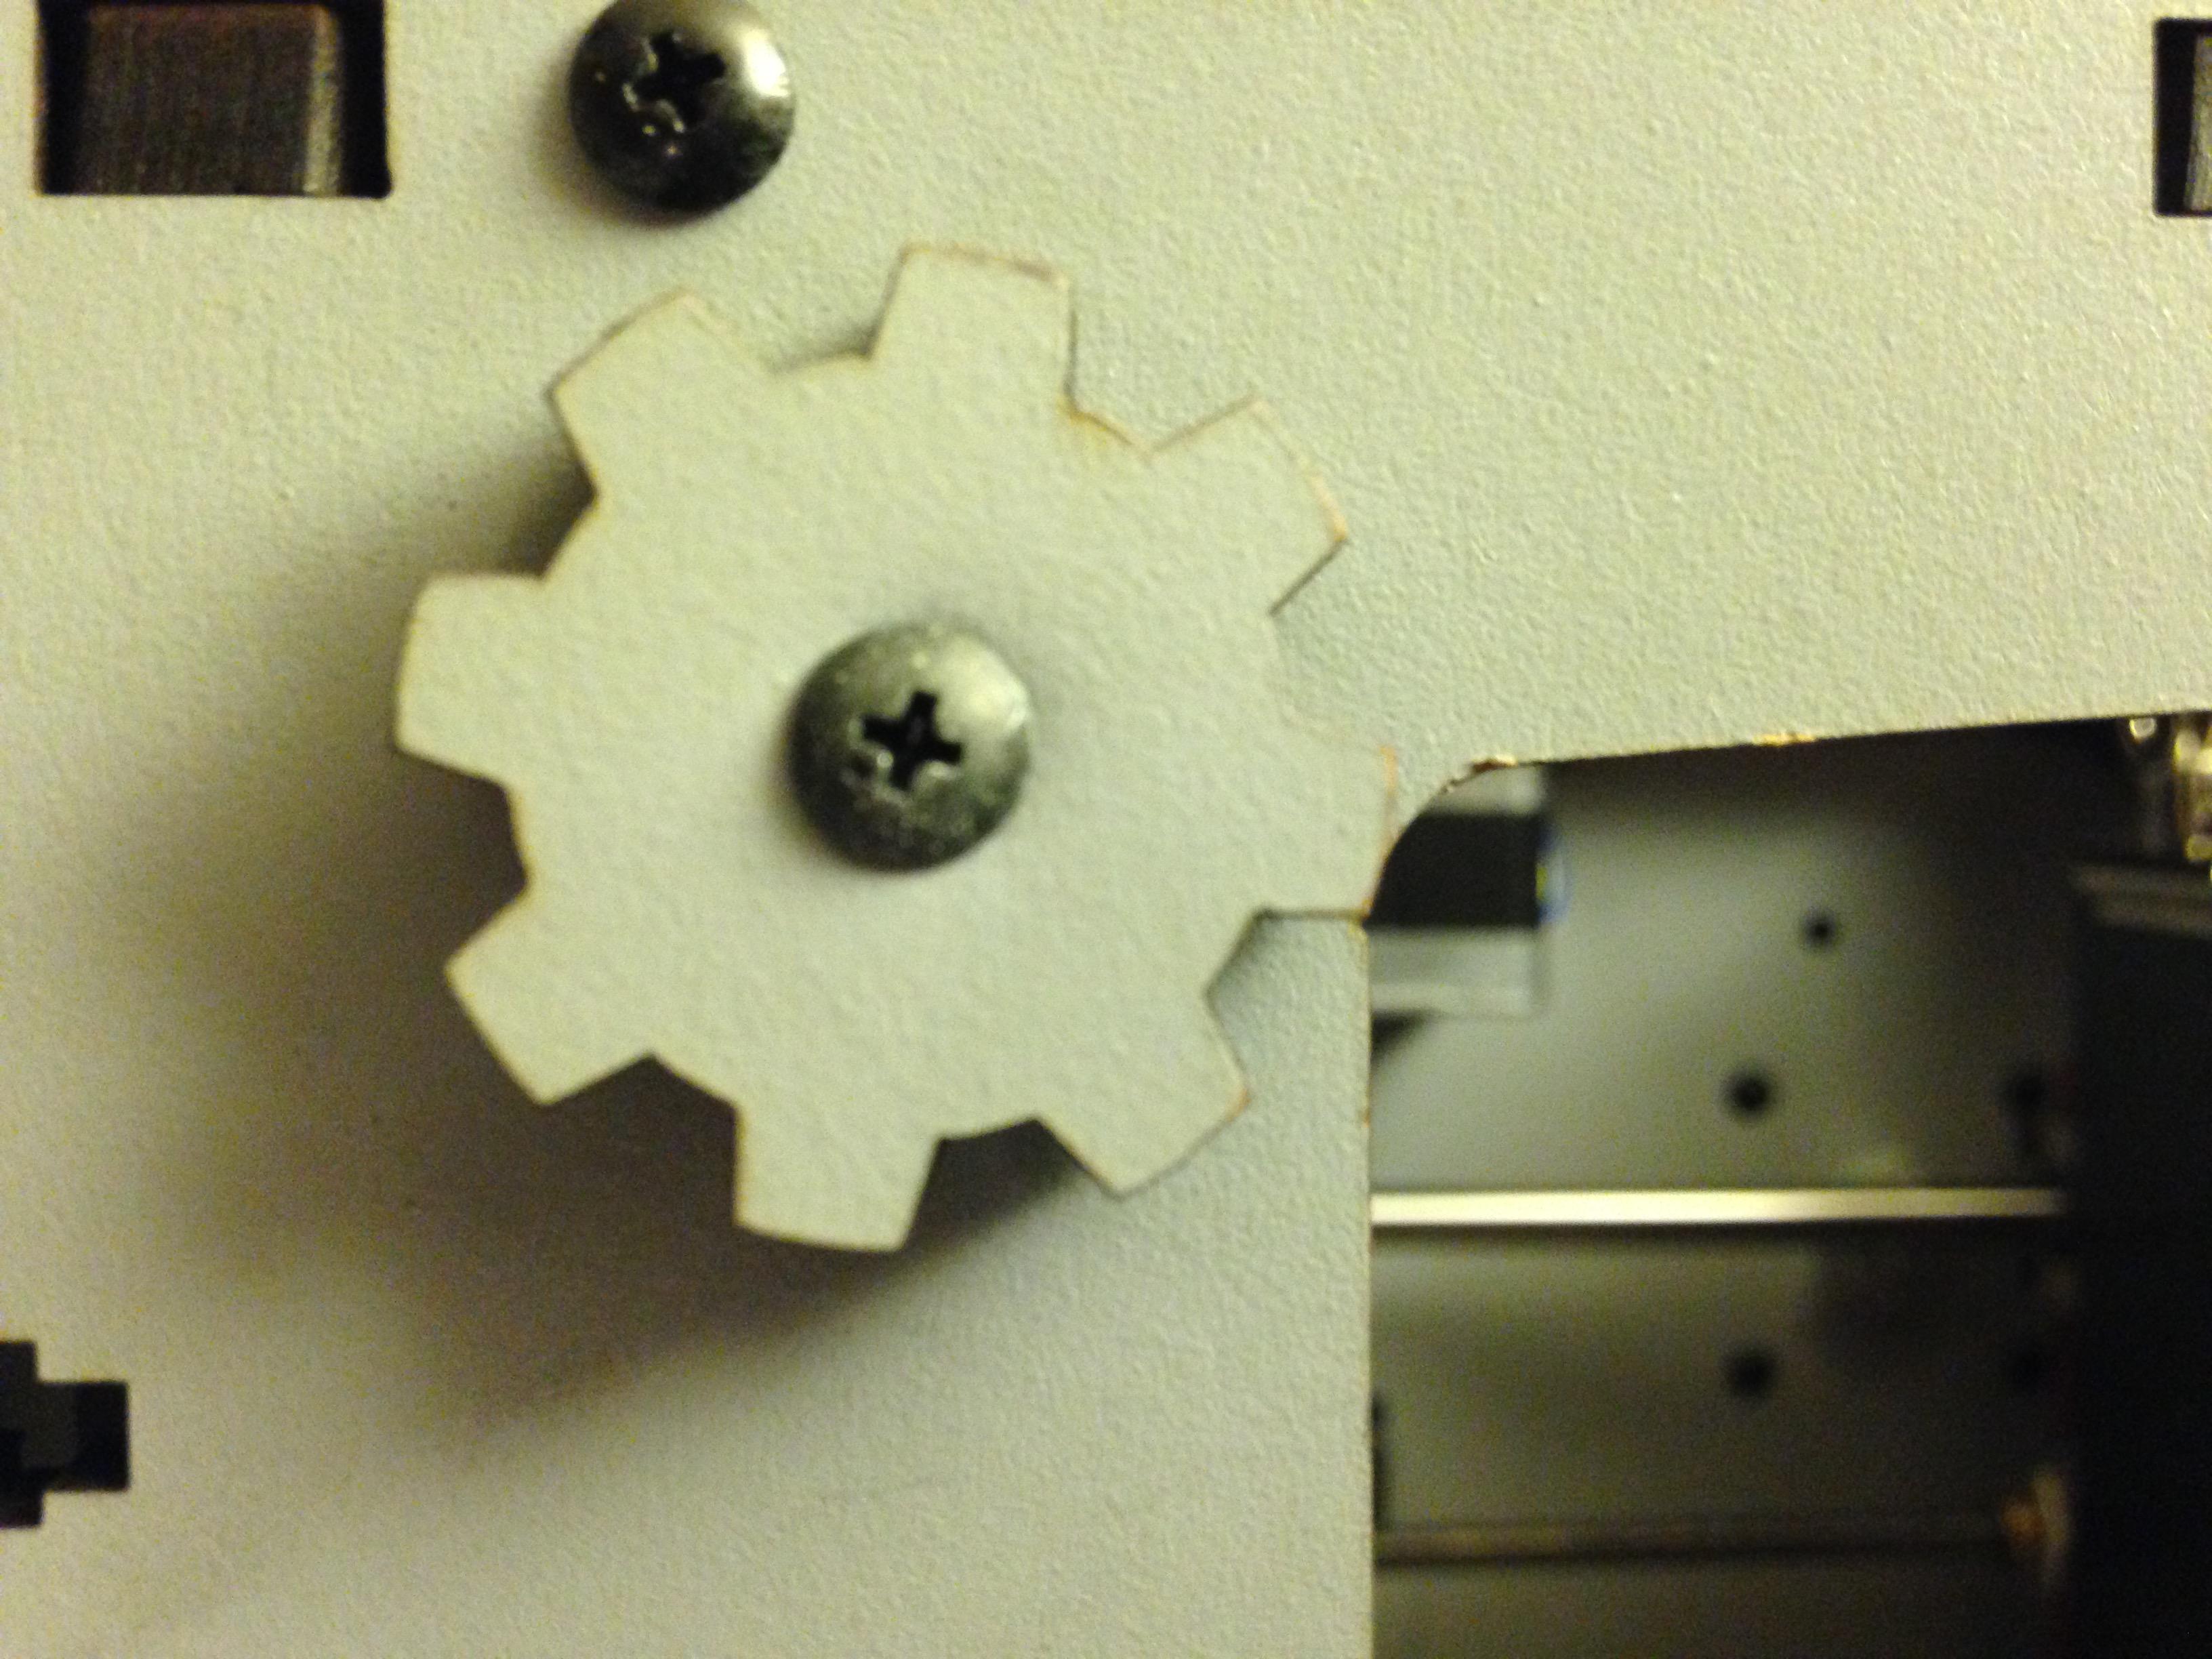 3Dプリンタ「BS01」を歯医者仕様にしてみた結果wwwww